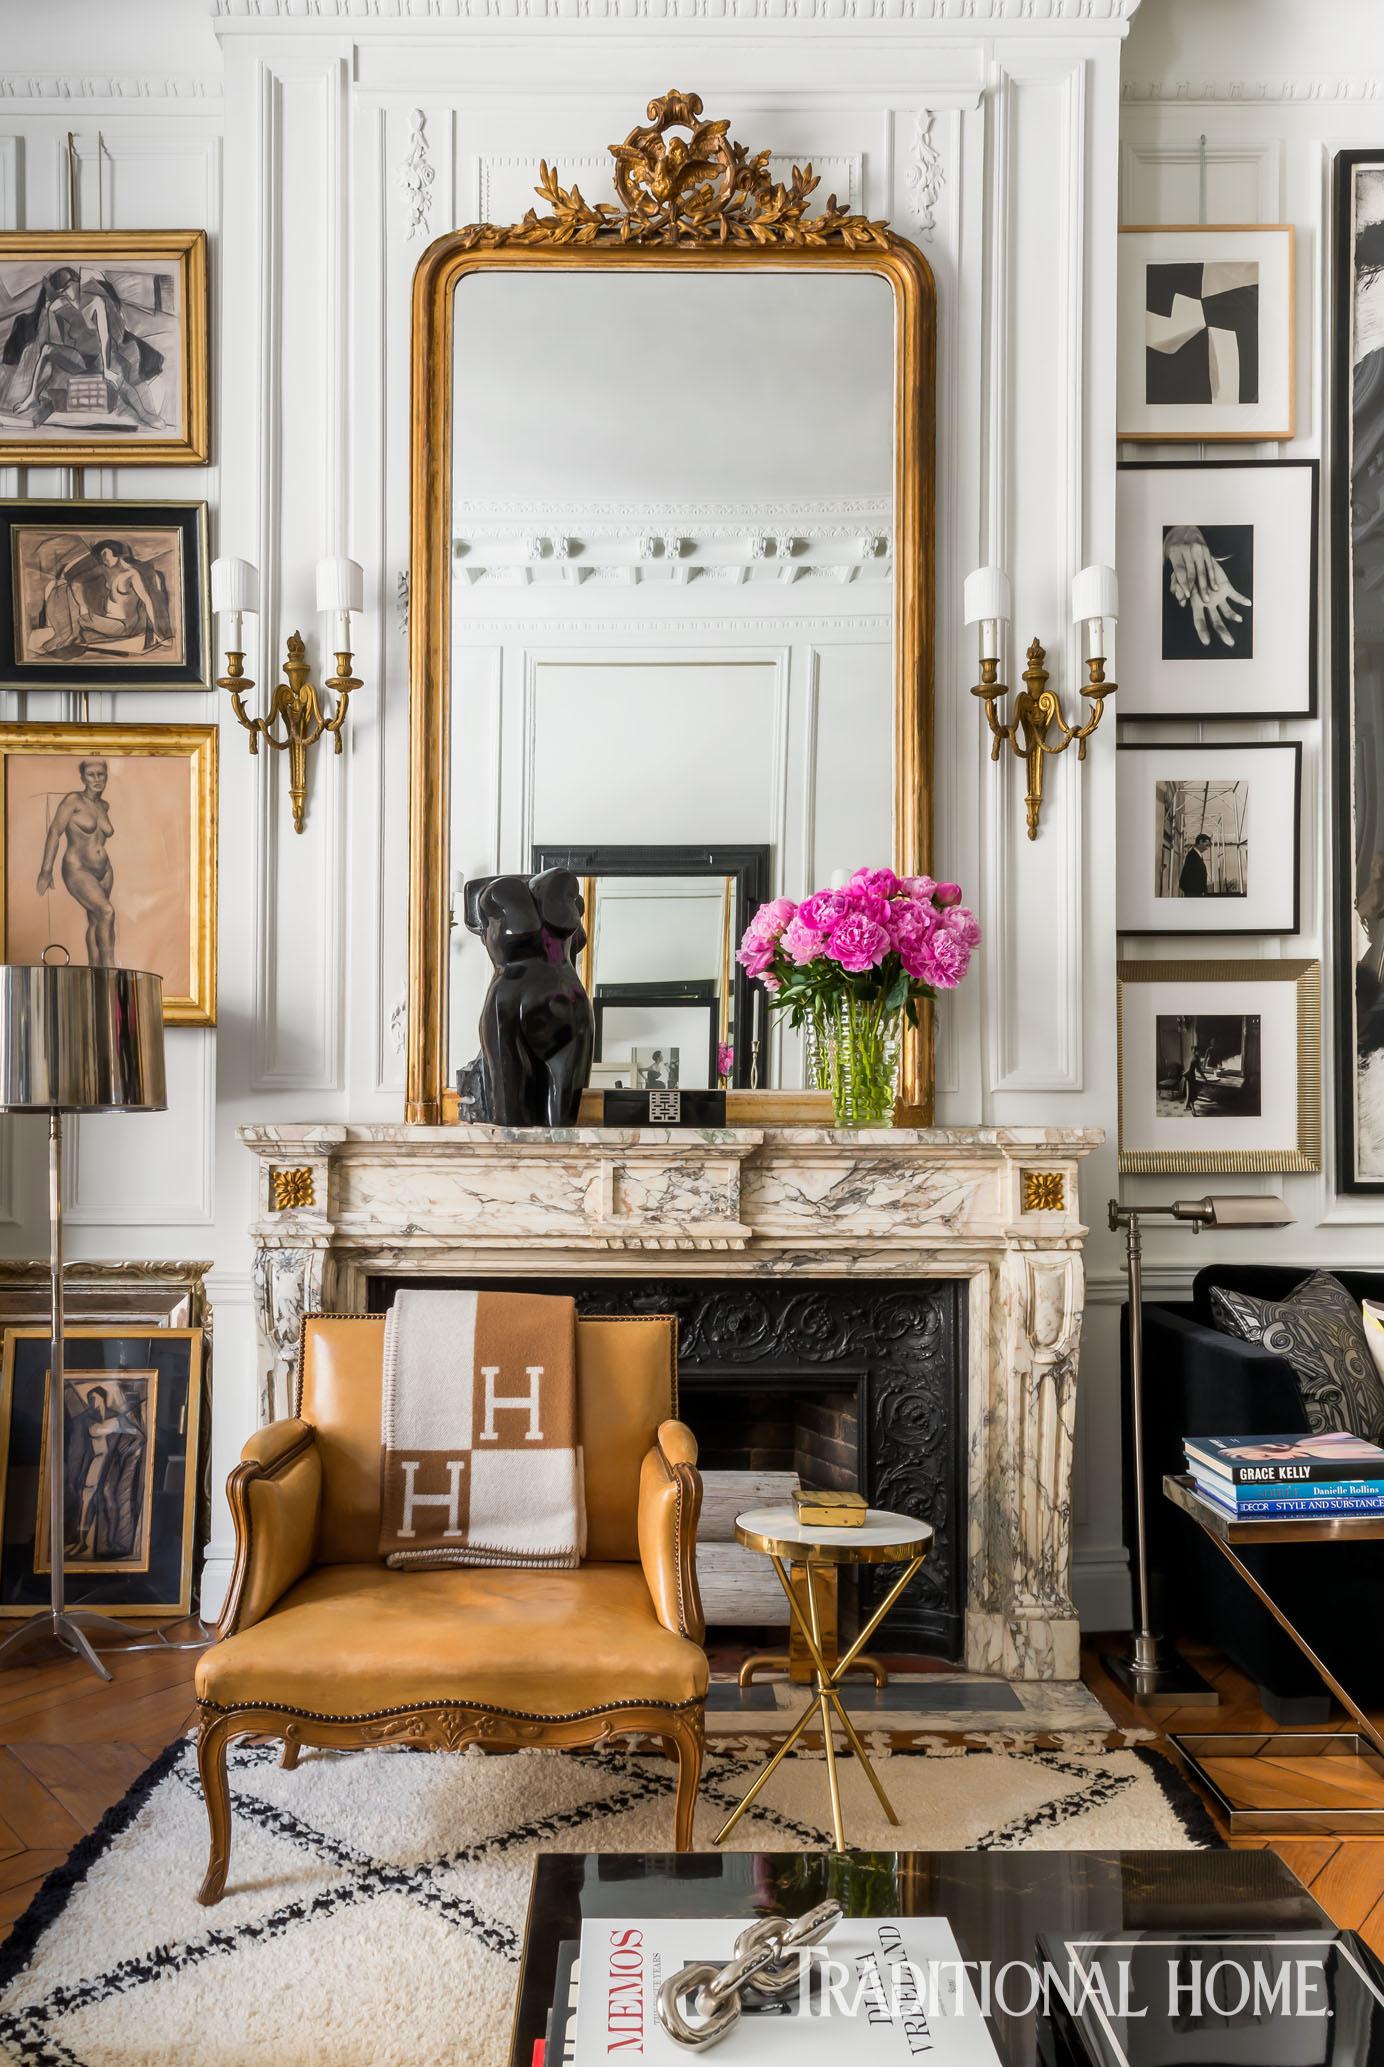 Solutions For Elegant Living Room Decor On A Budget Decoholic